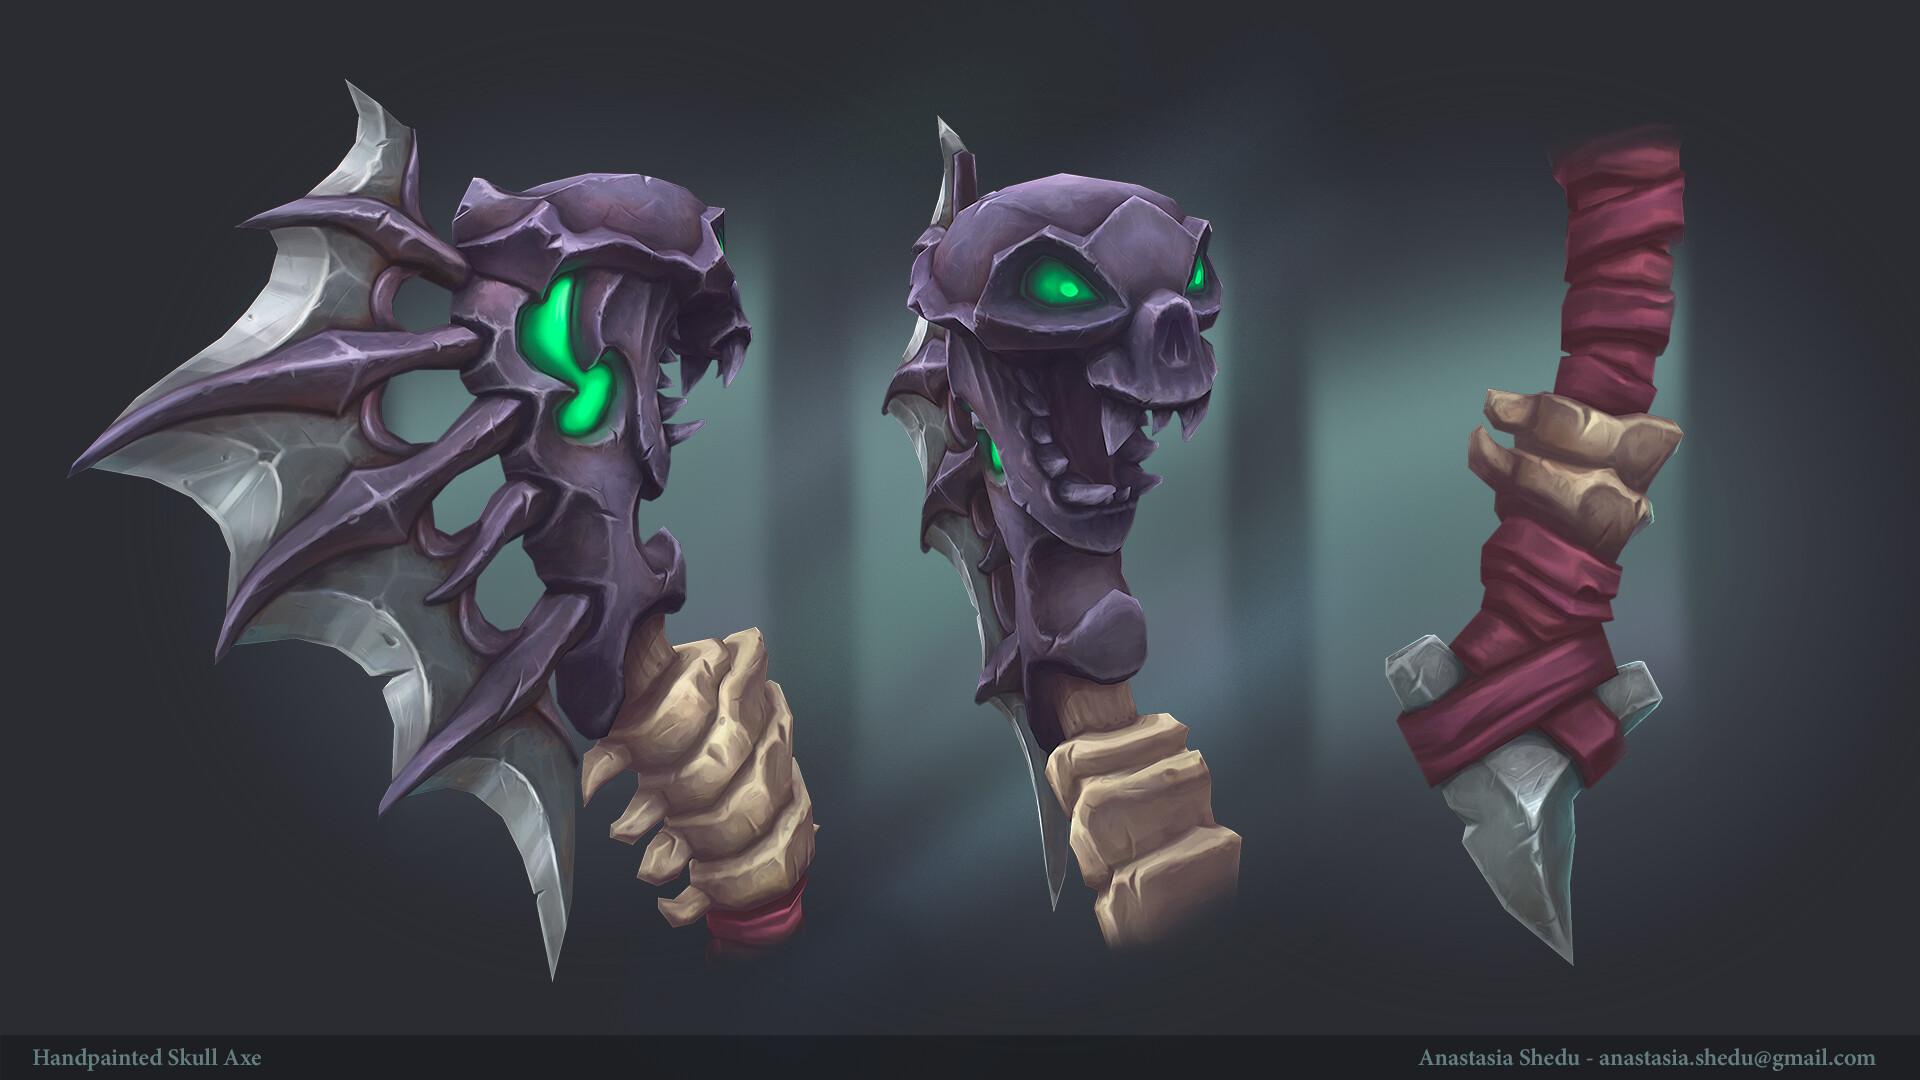 Anastasia shedu handpainted skull axe details